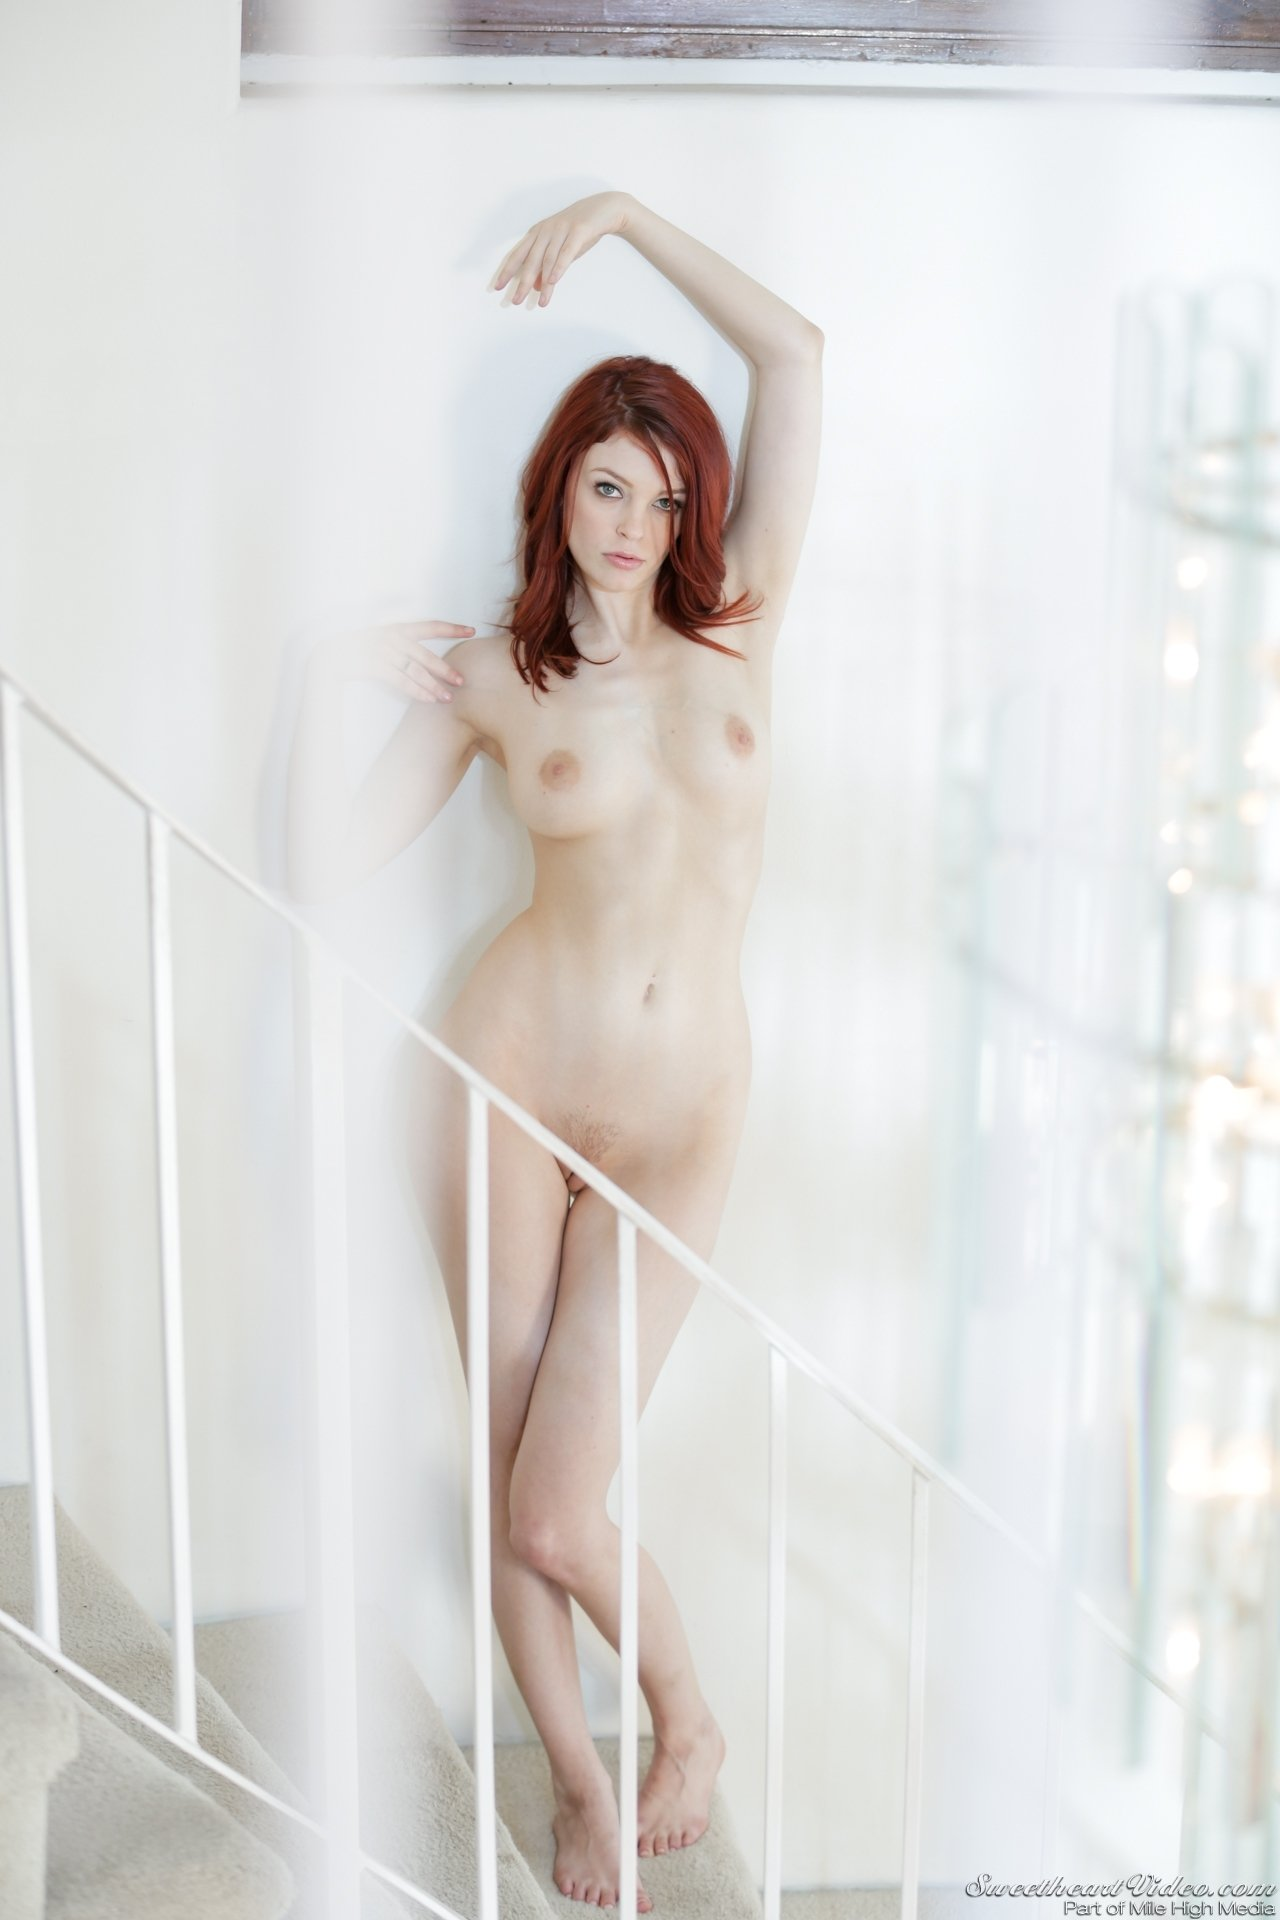 Bree Essrig – lewd lingerie lesbian make out NSFW